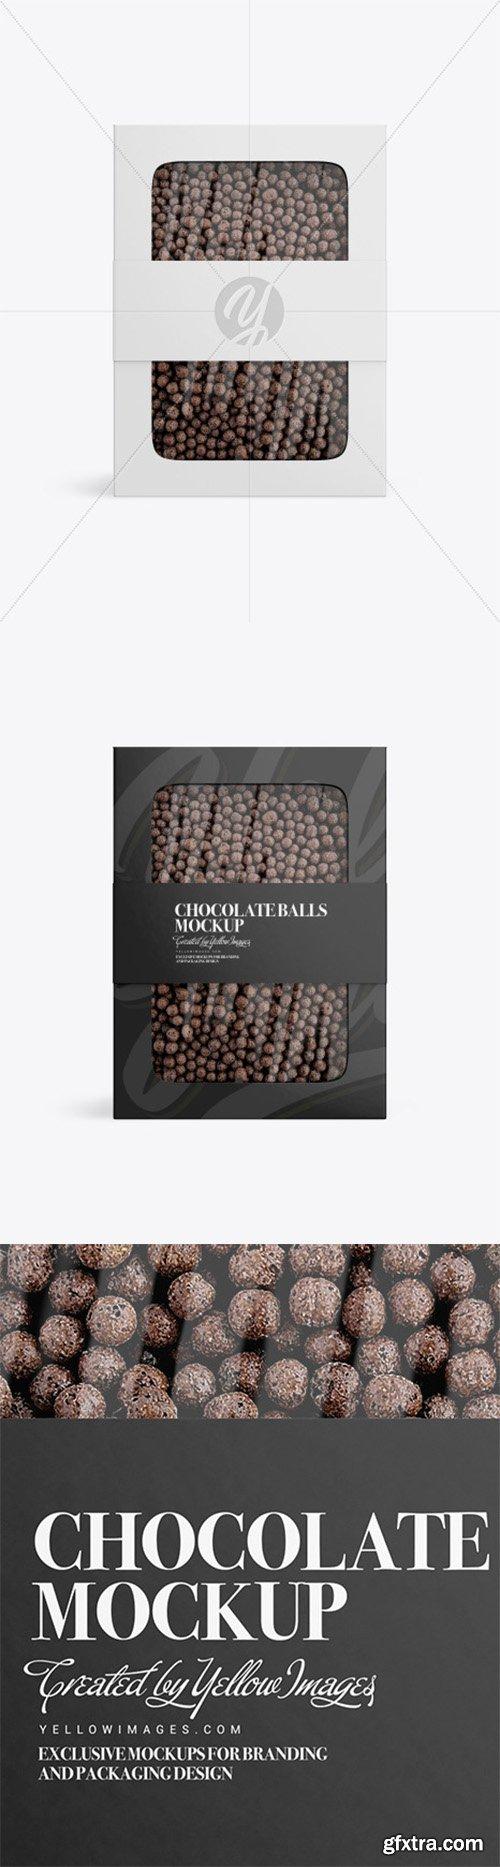 Paper Box With Chocolate Balls Mockup 80823